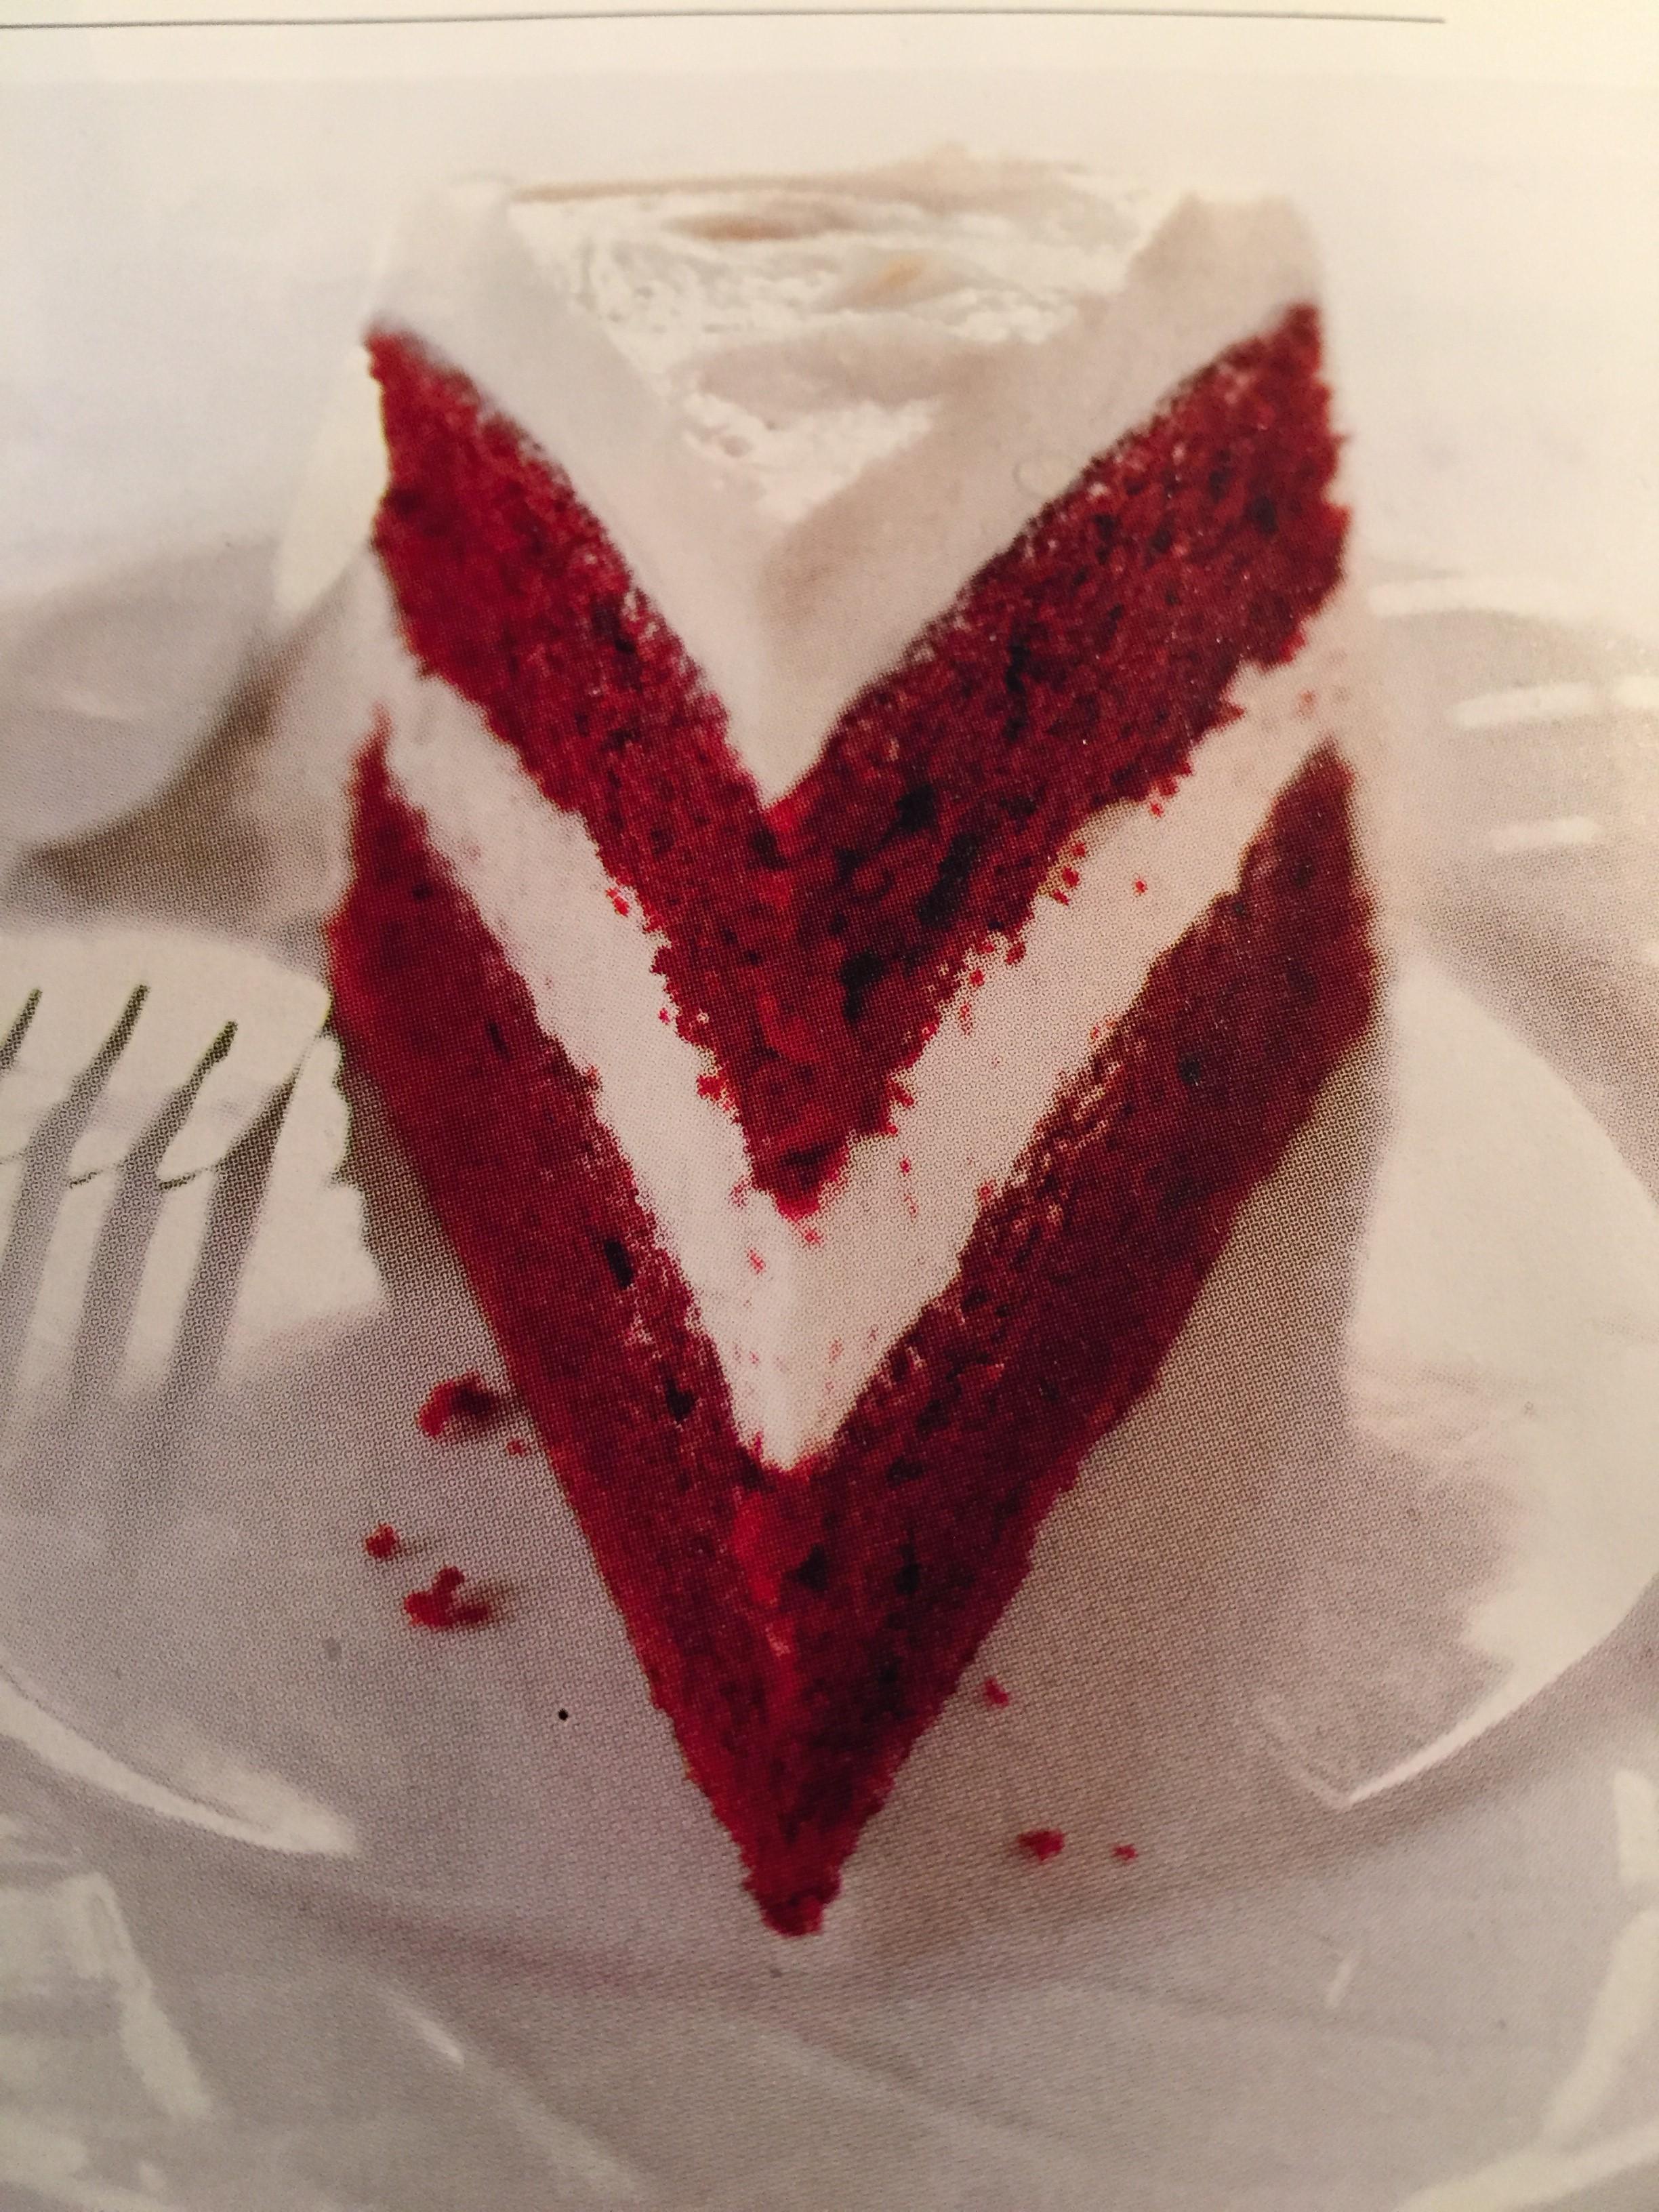 Photo of Cake from ATK zine